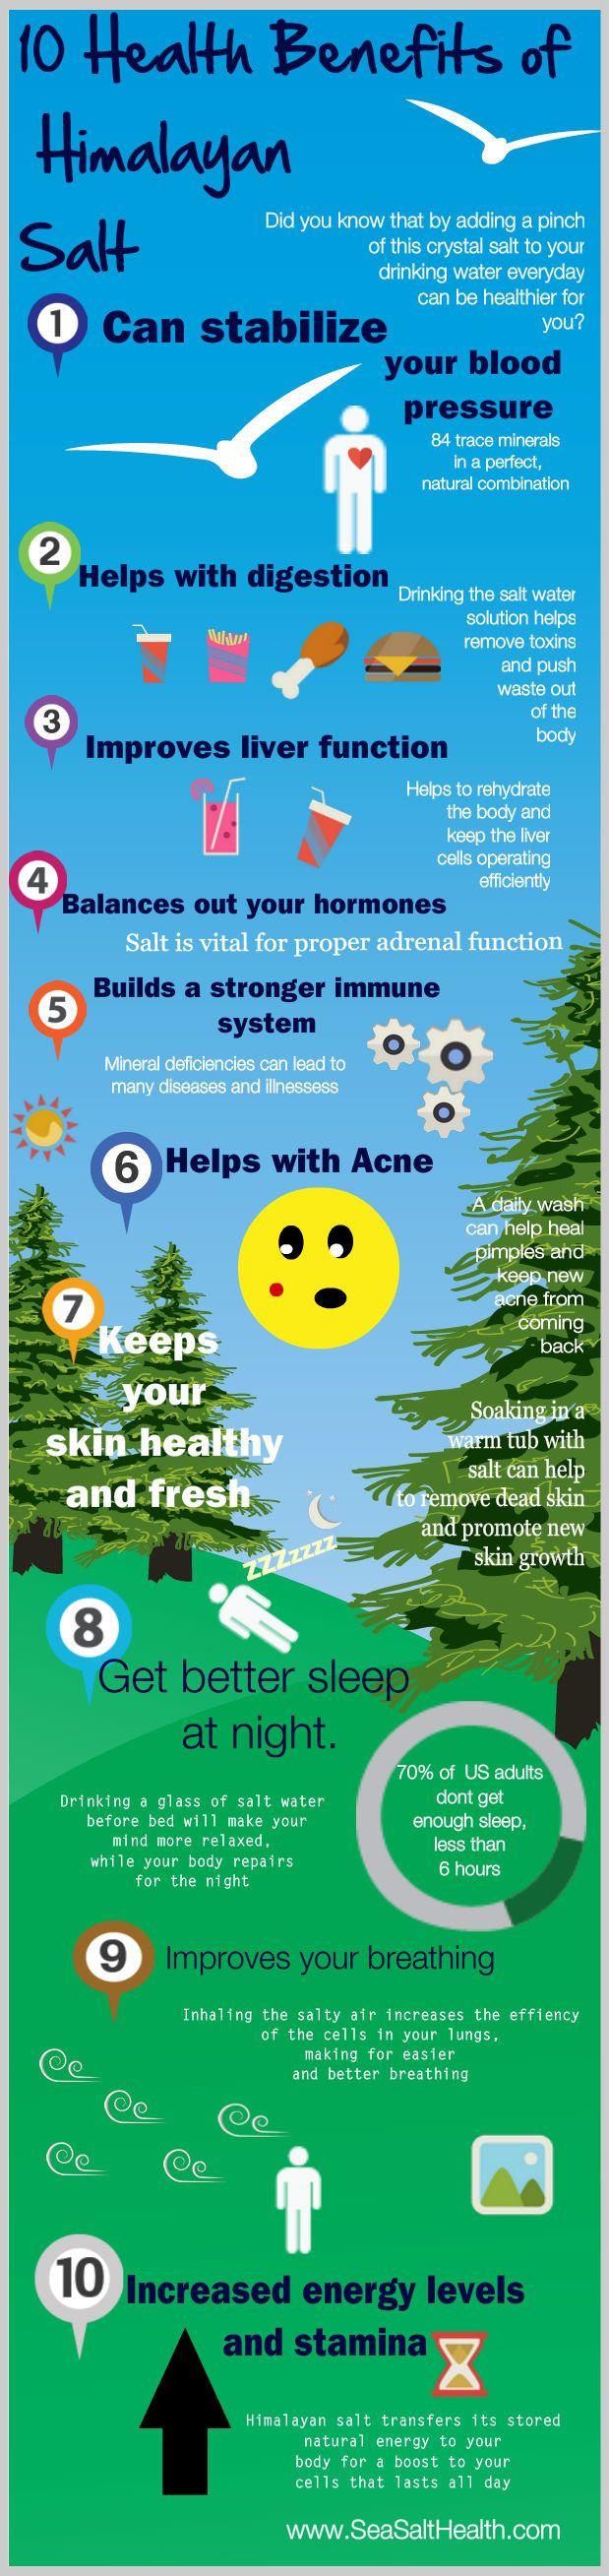 10 Health Benefits of Himalayan Salt - http://www.seasalthealth.com